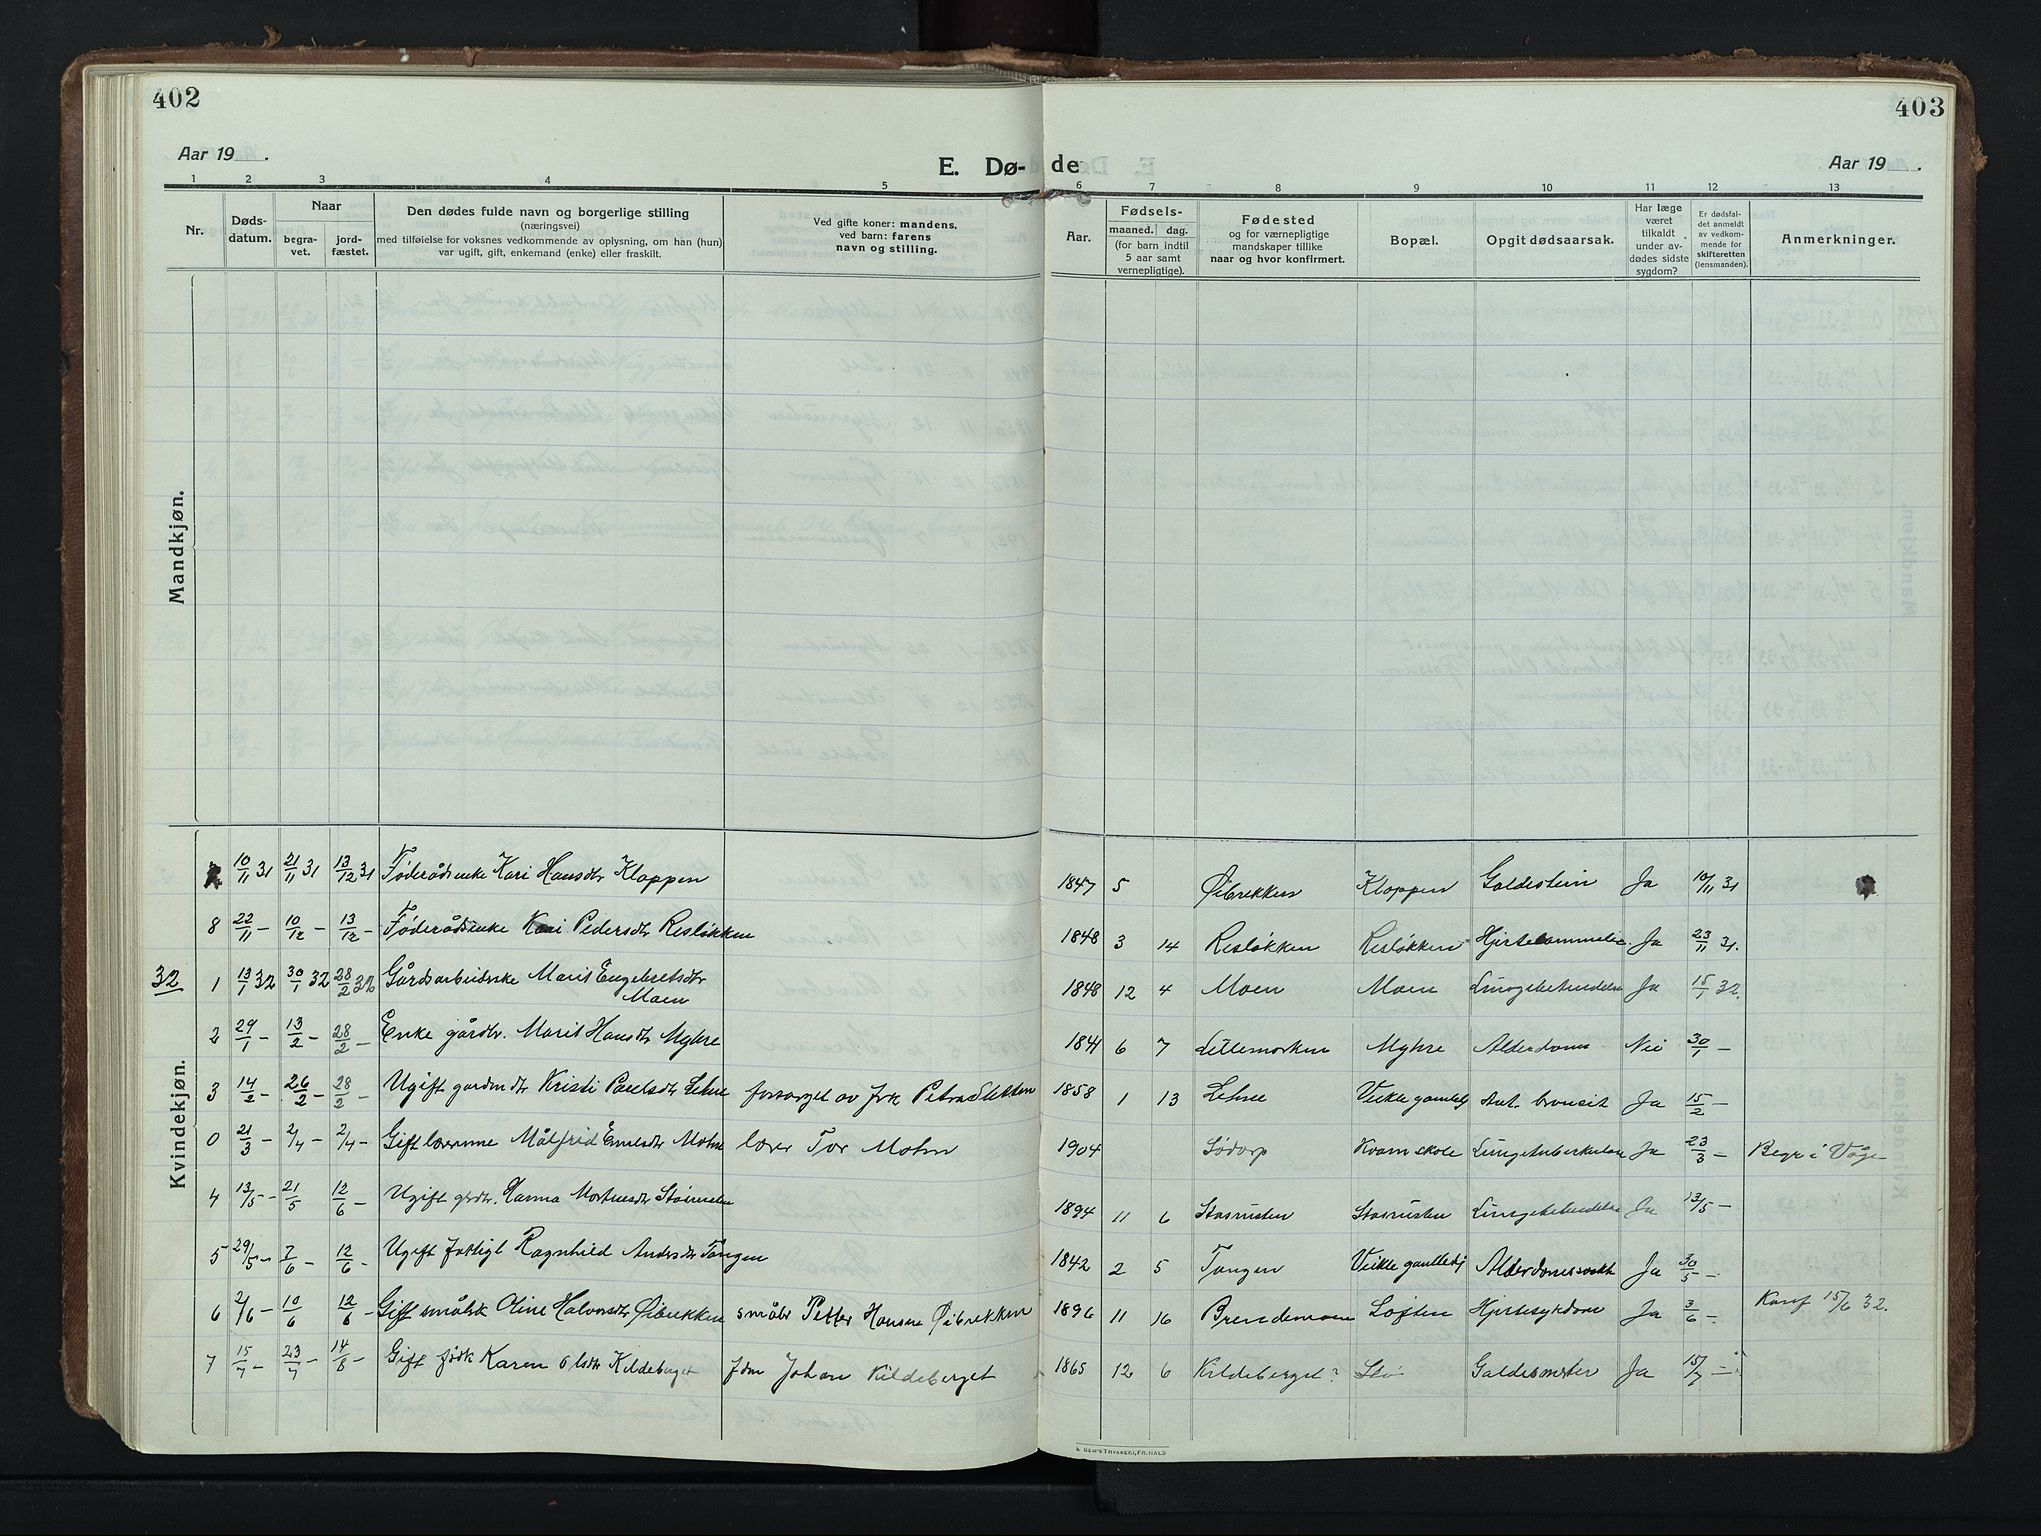 SAH, Nord-Fron prestekontor, Klokkerbok nr. 8, 1915-1948, s. 402-403